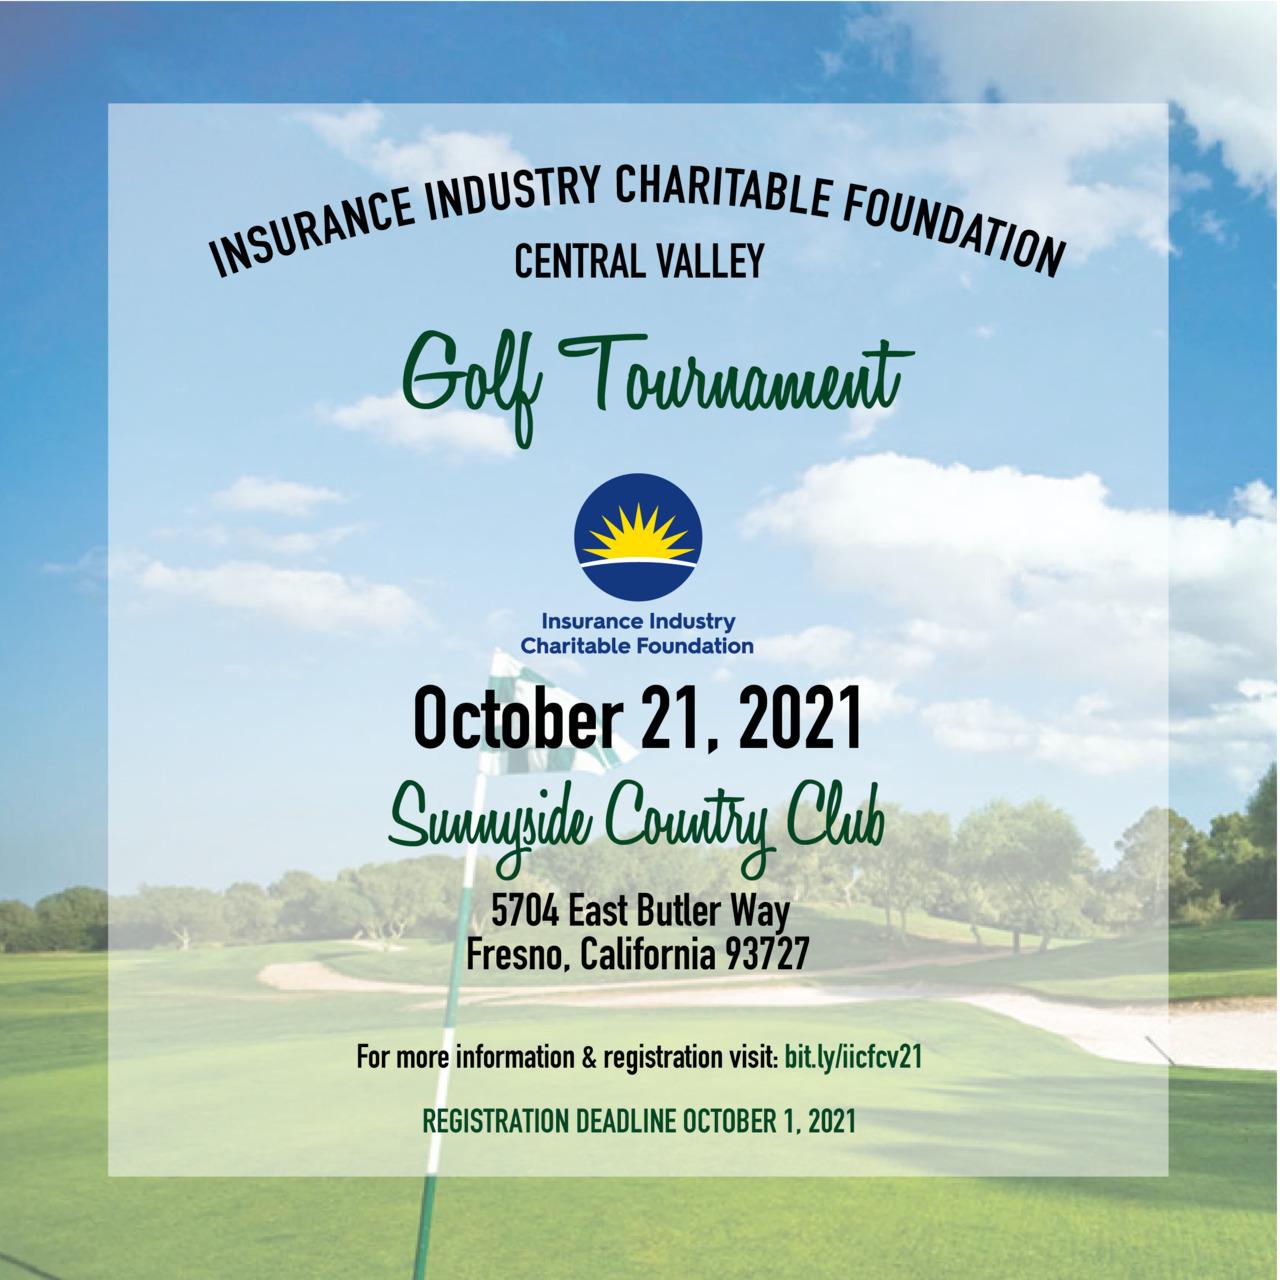 IICF Central Valley Golf Tournament 2021